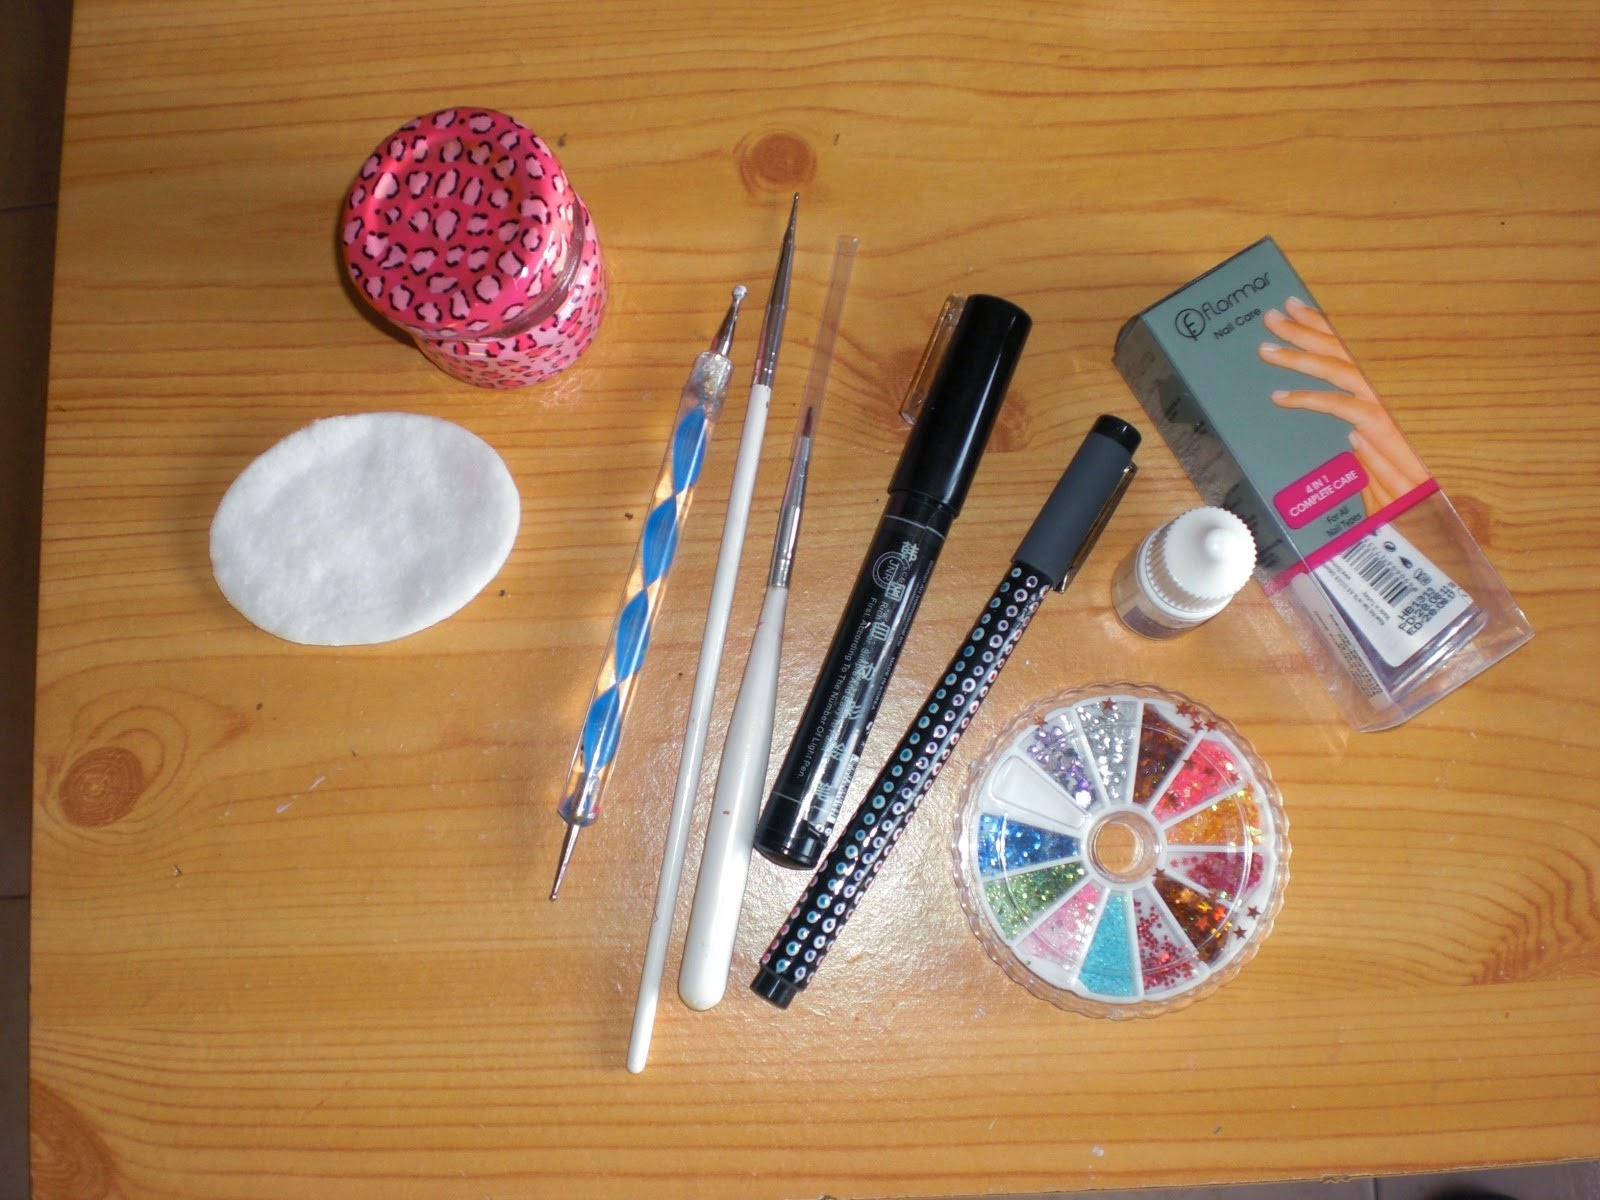 10 bellesalud bellas u as azules v deo paso a paso - Materiales para pintar ...